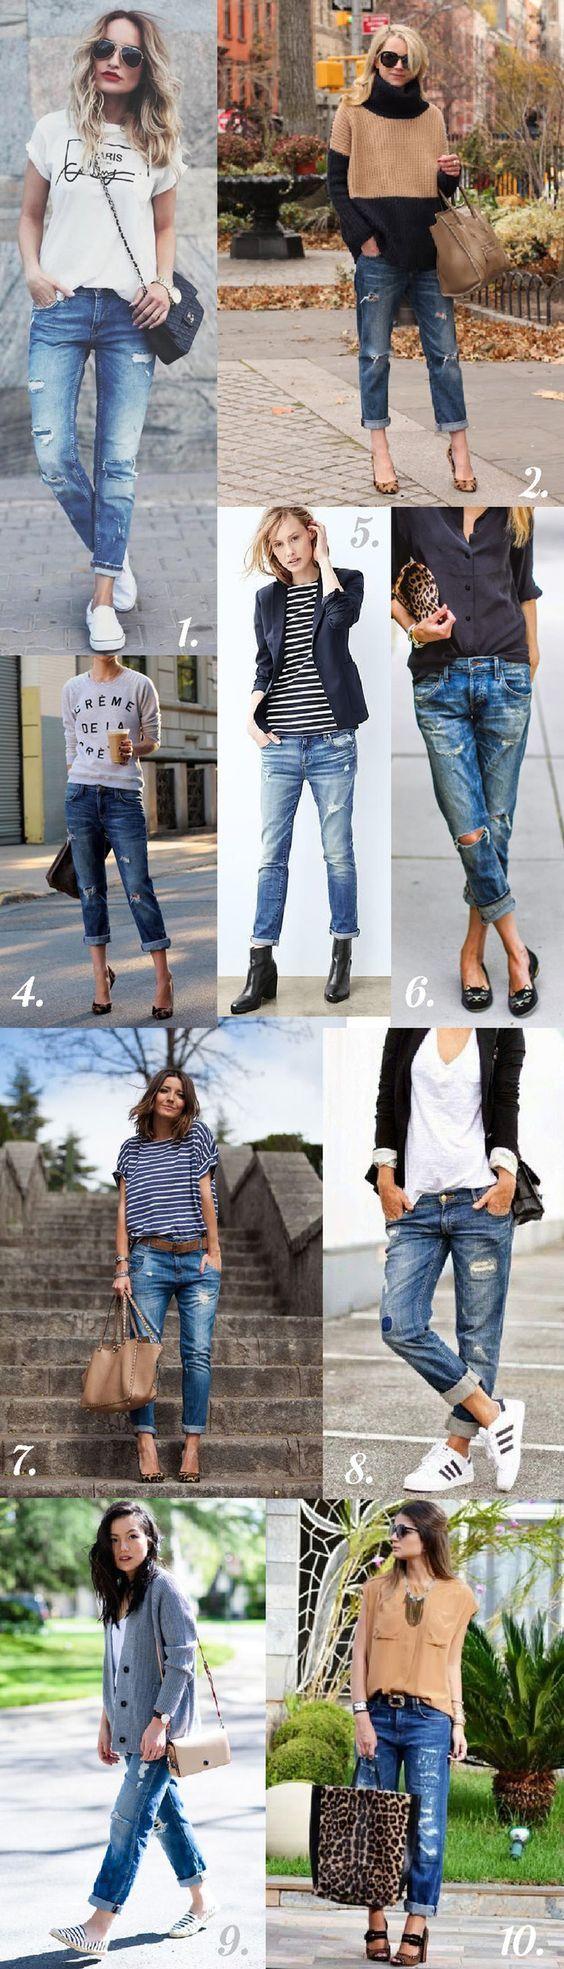 come indossare i jeans